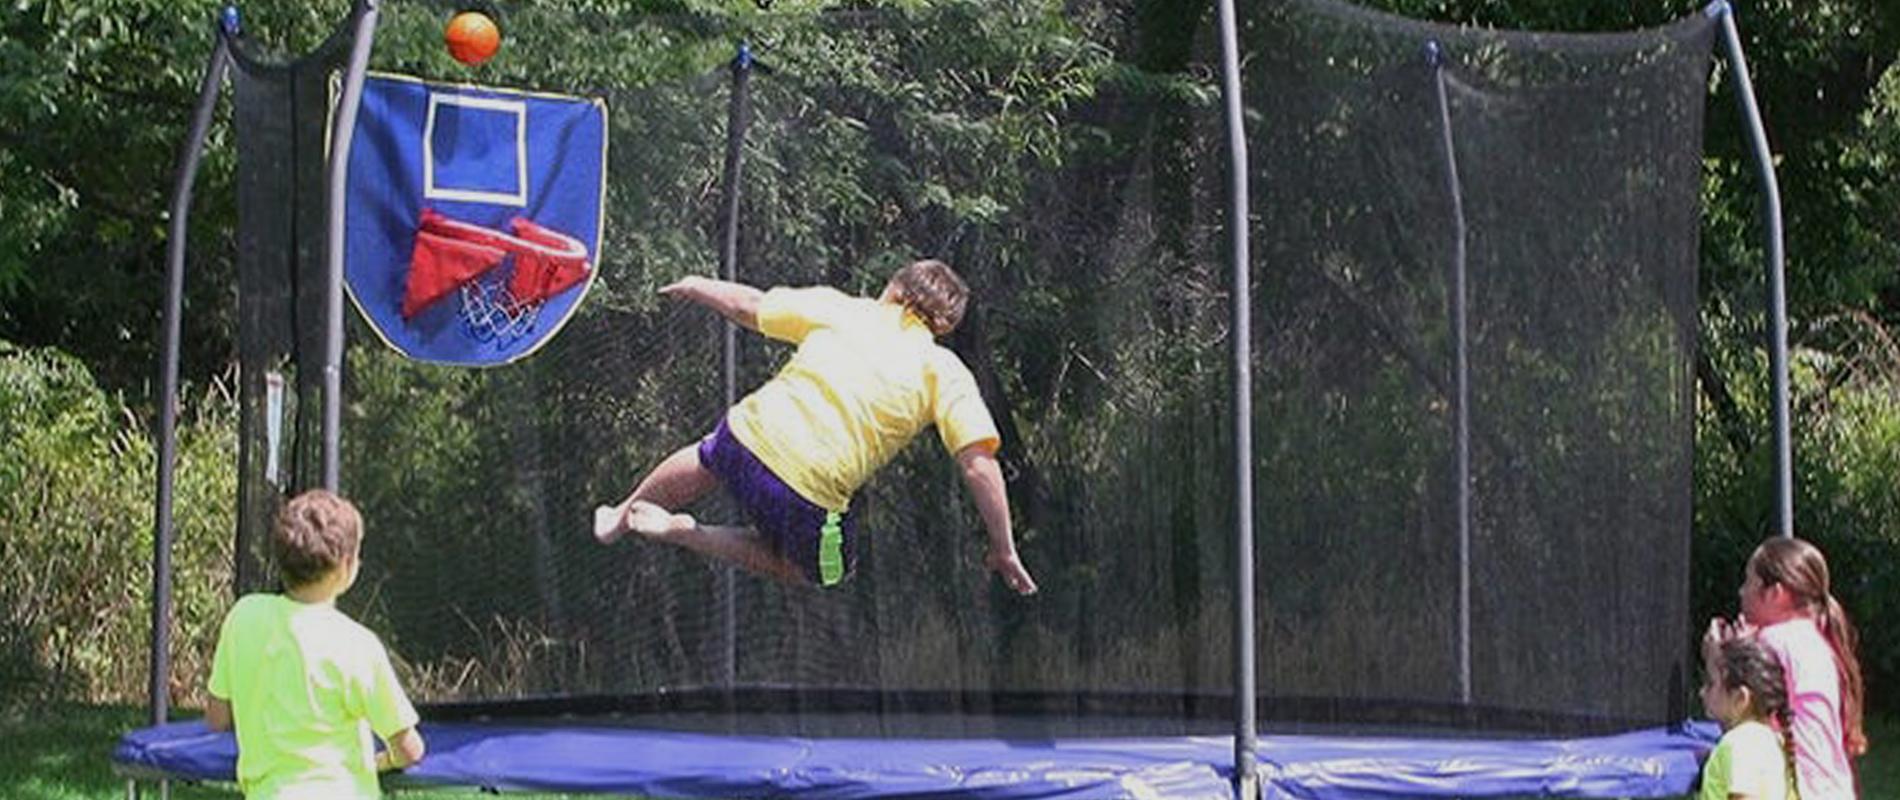 trampoline with basketball hoop